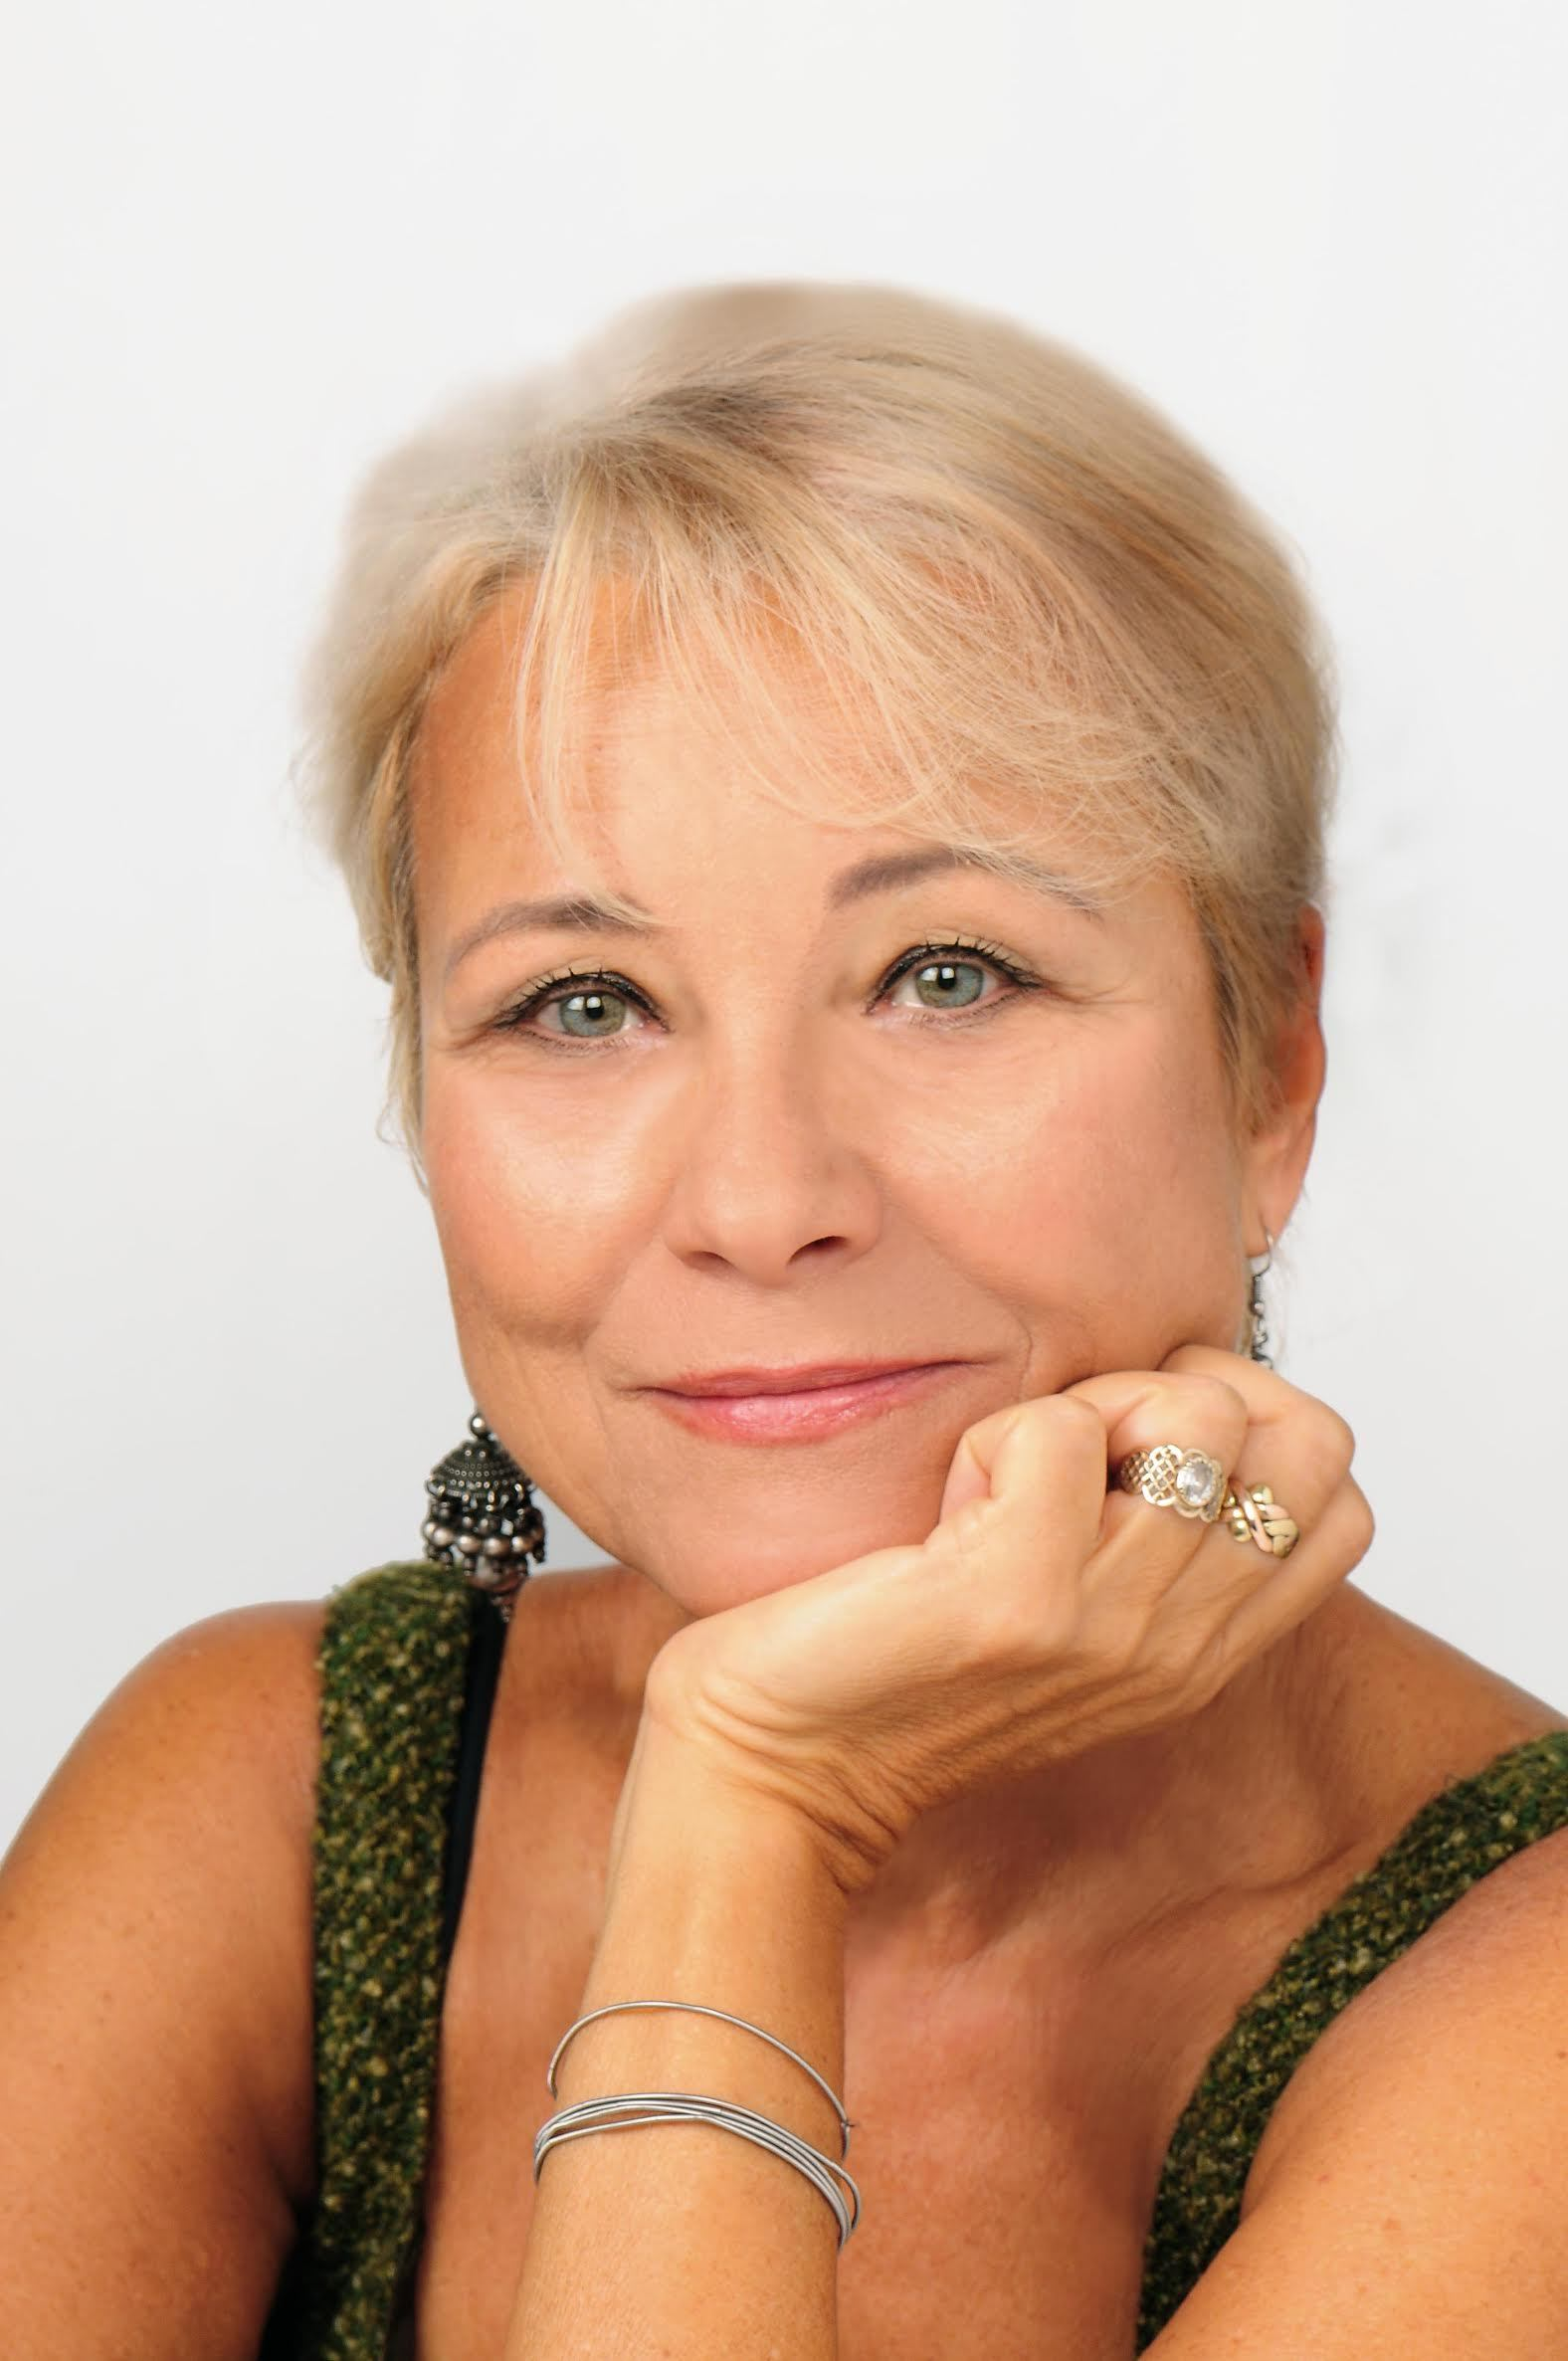 Chiara Bettelli Lellio